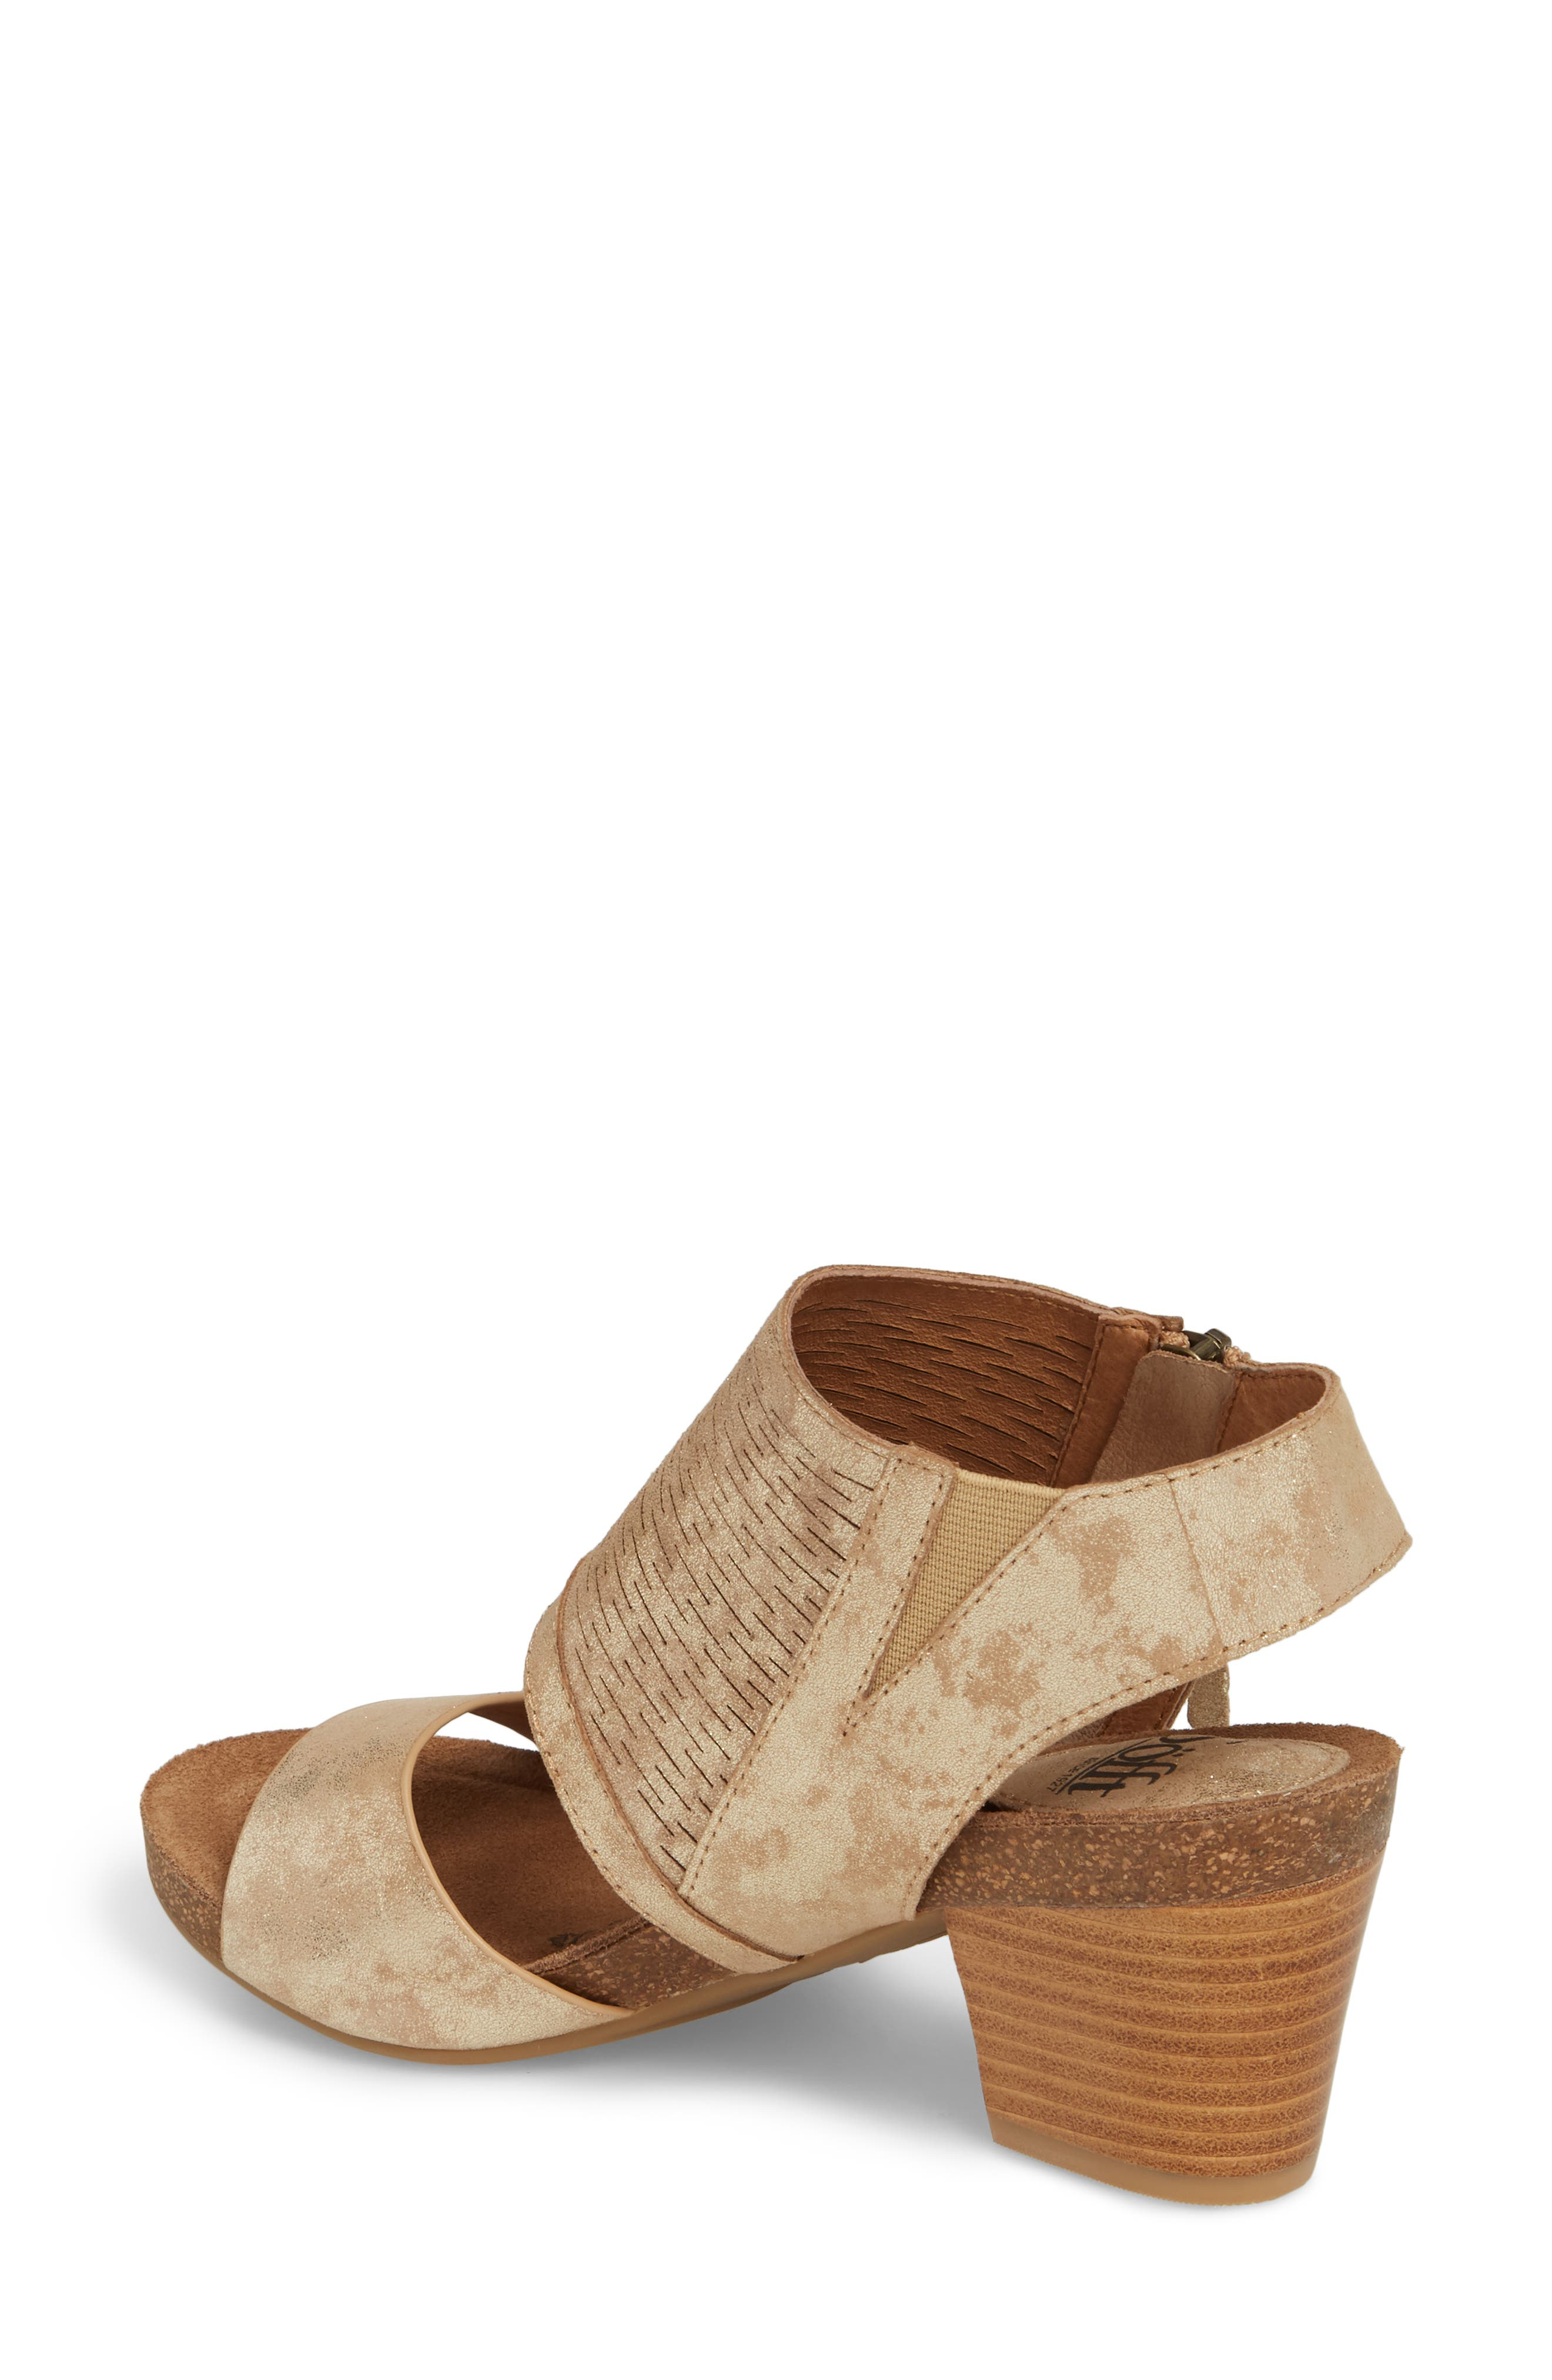 Milan Block Heel Sandal,                             Alternate thumbnail 2, color,                             Platino Distressed Foil Suede